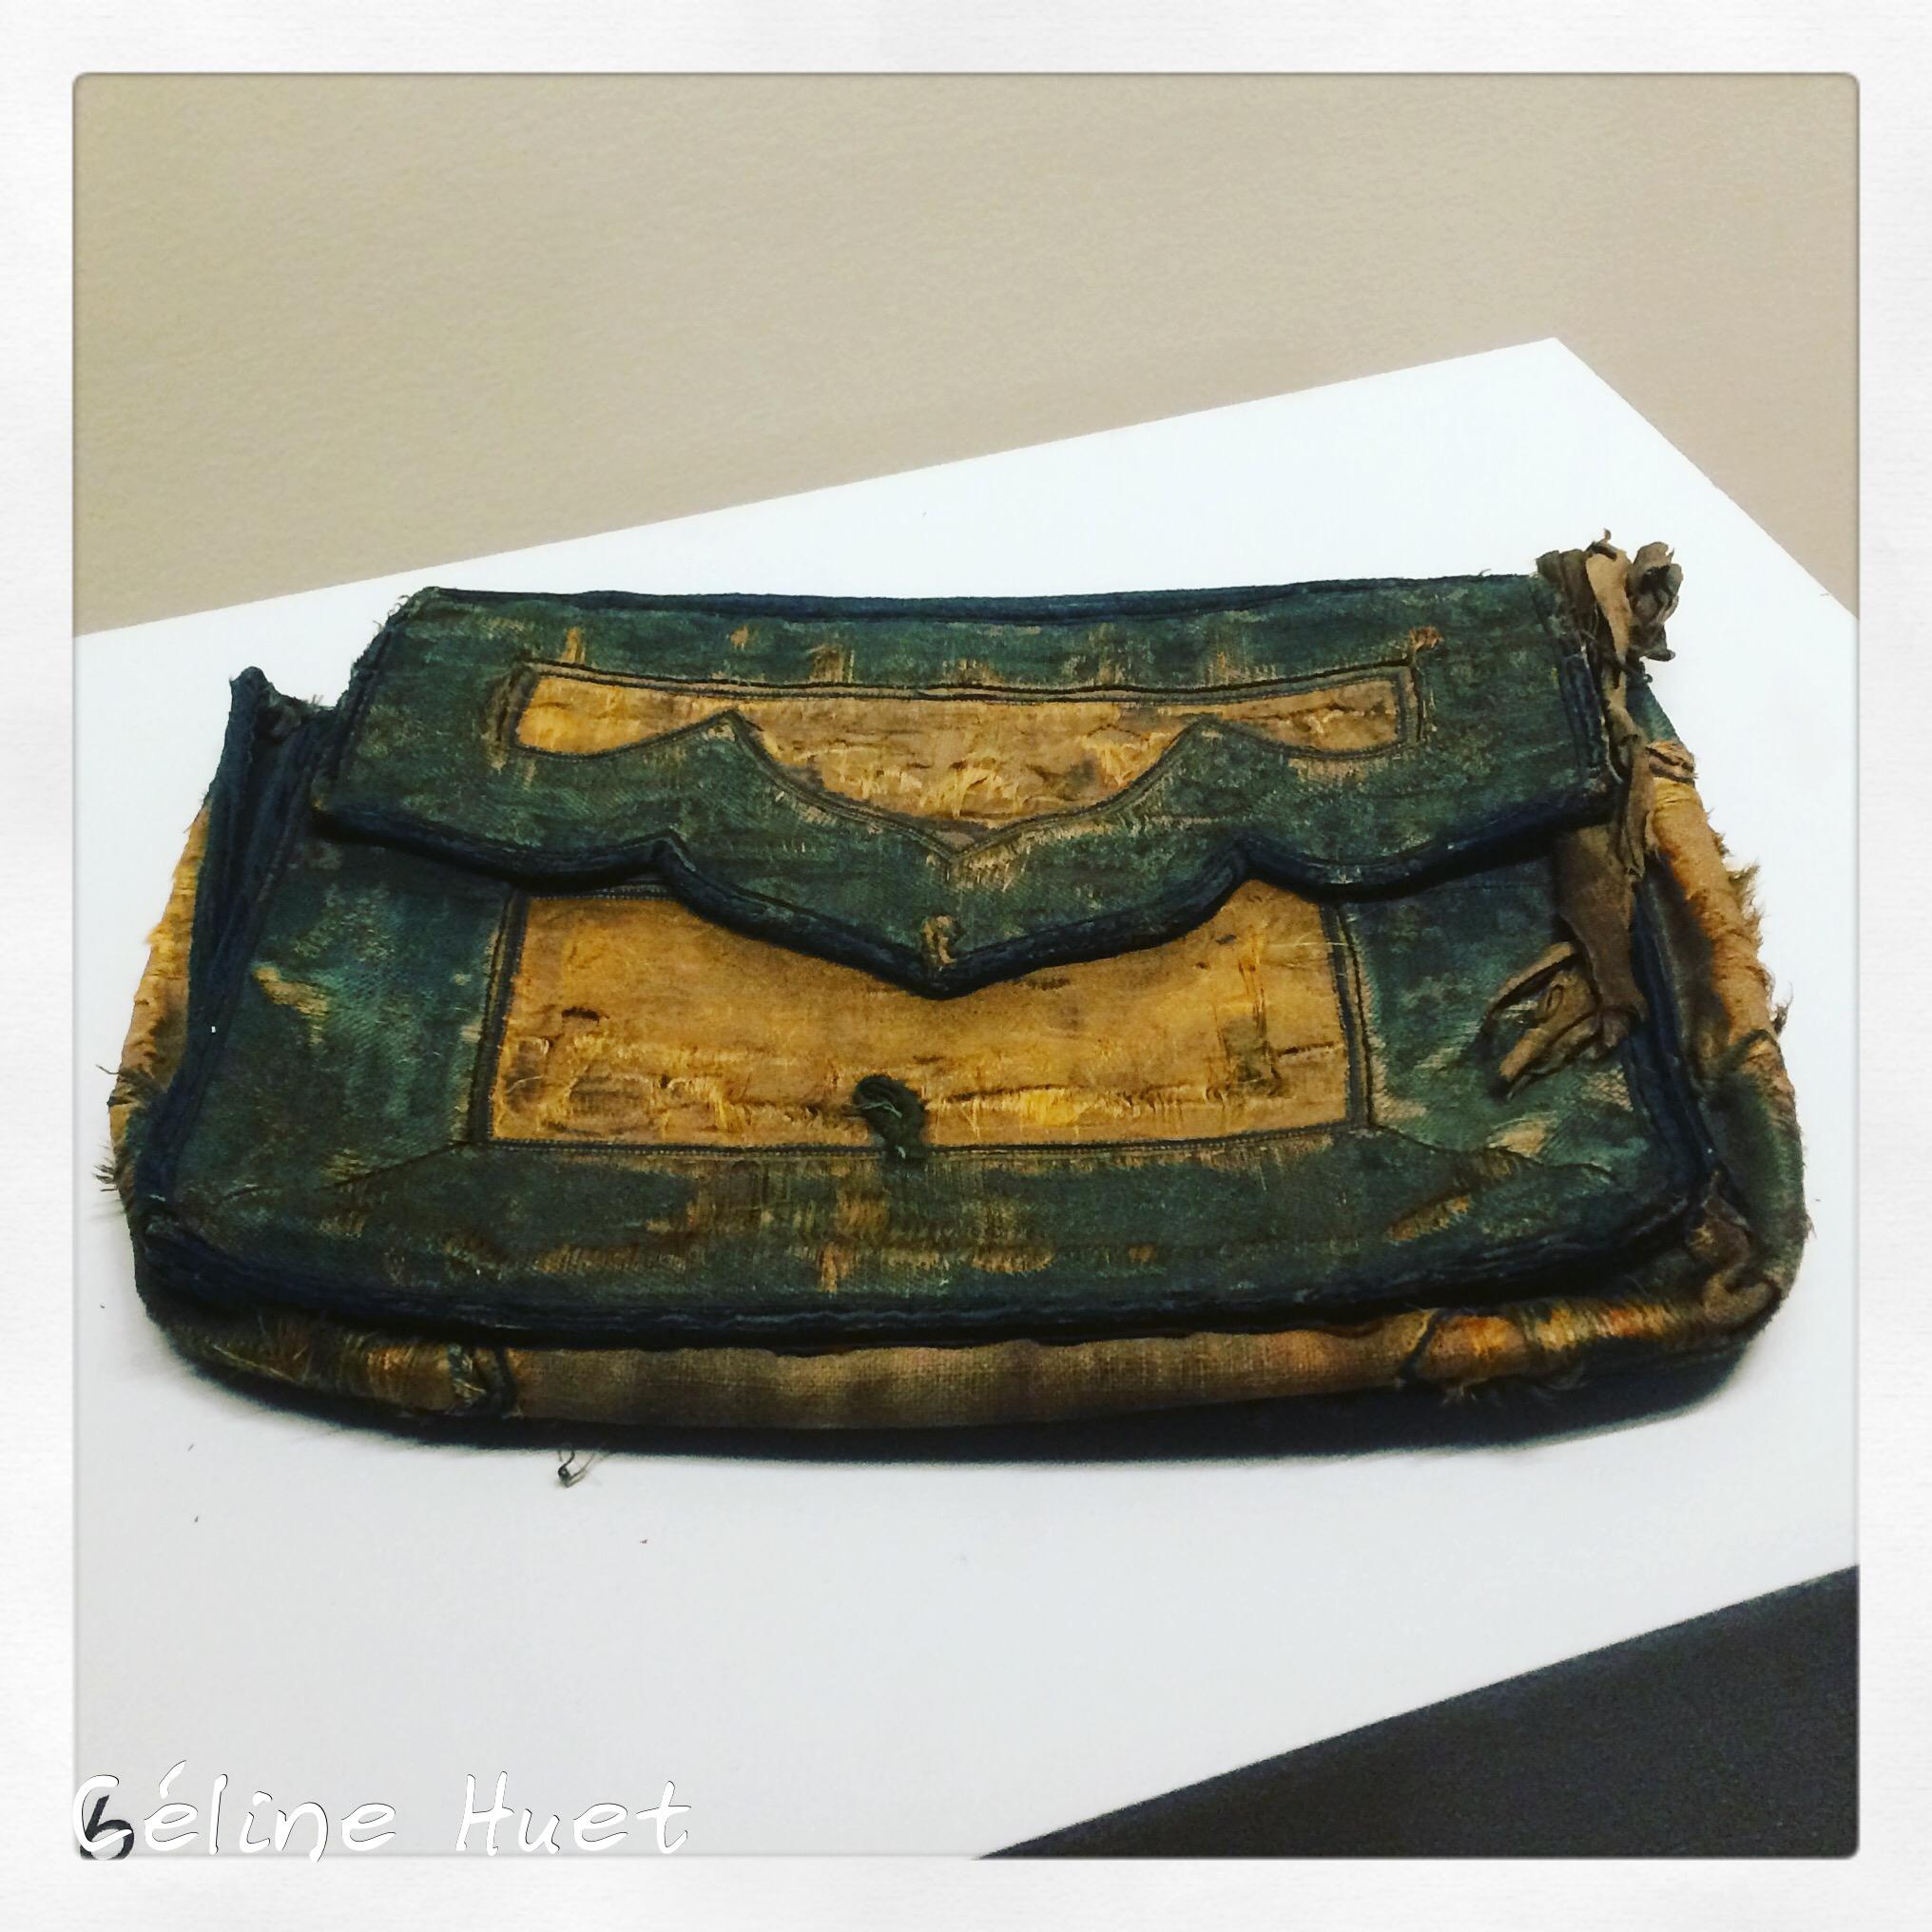 Son sac tibétain Exposition Alexandra David-Néel Musée Guimet Paris